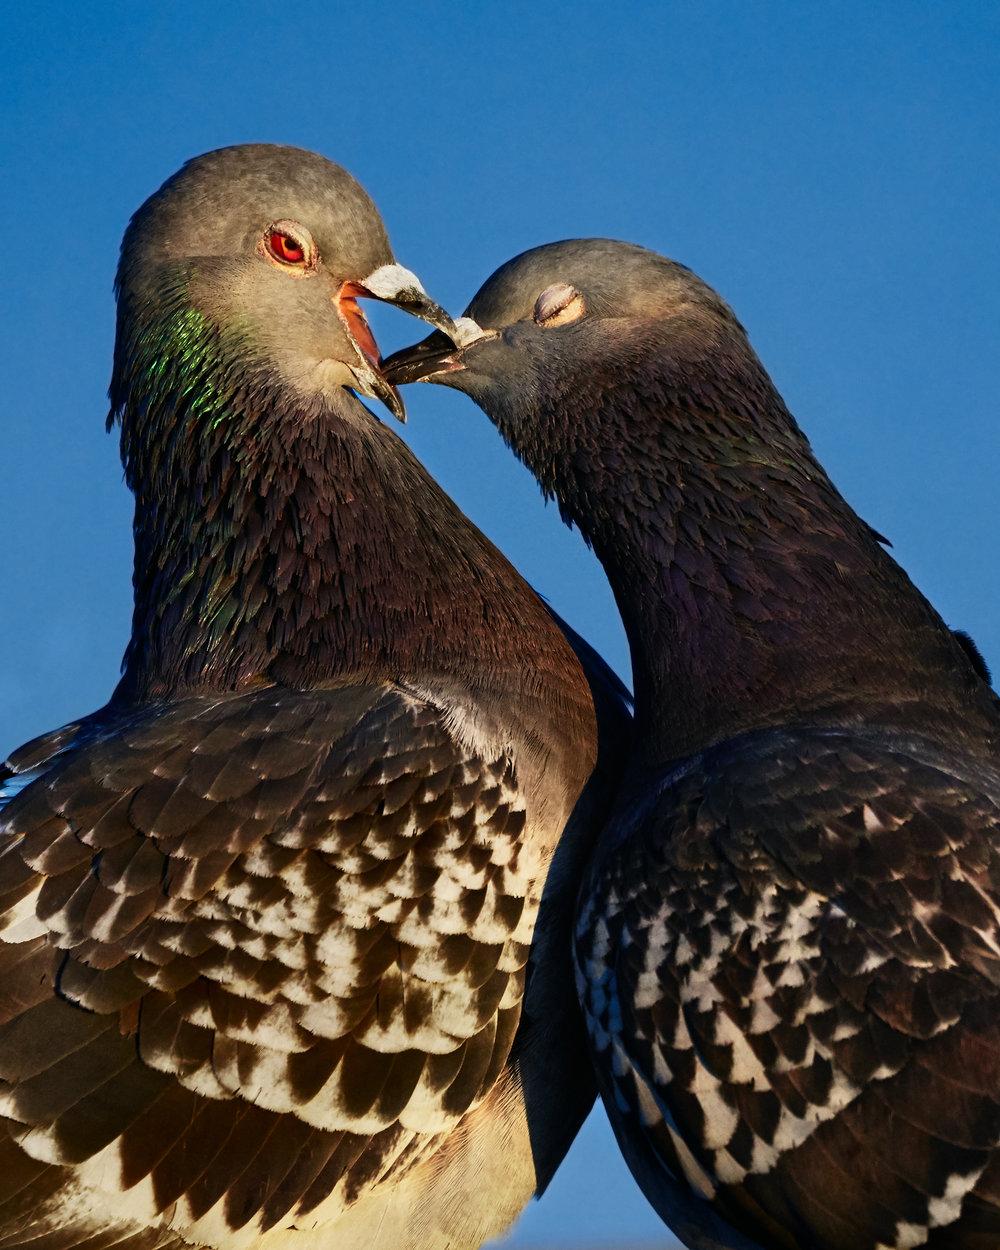 Pigeon_001.jpg